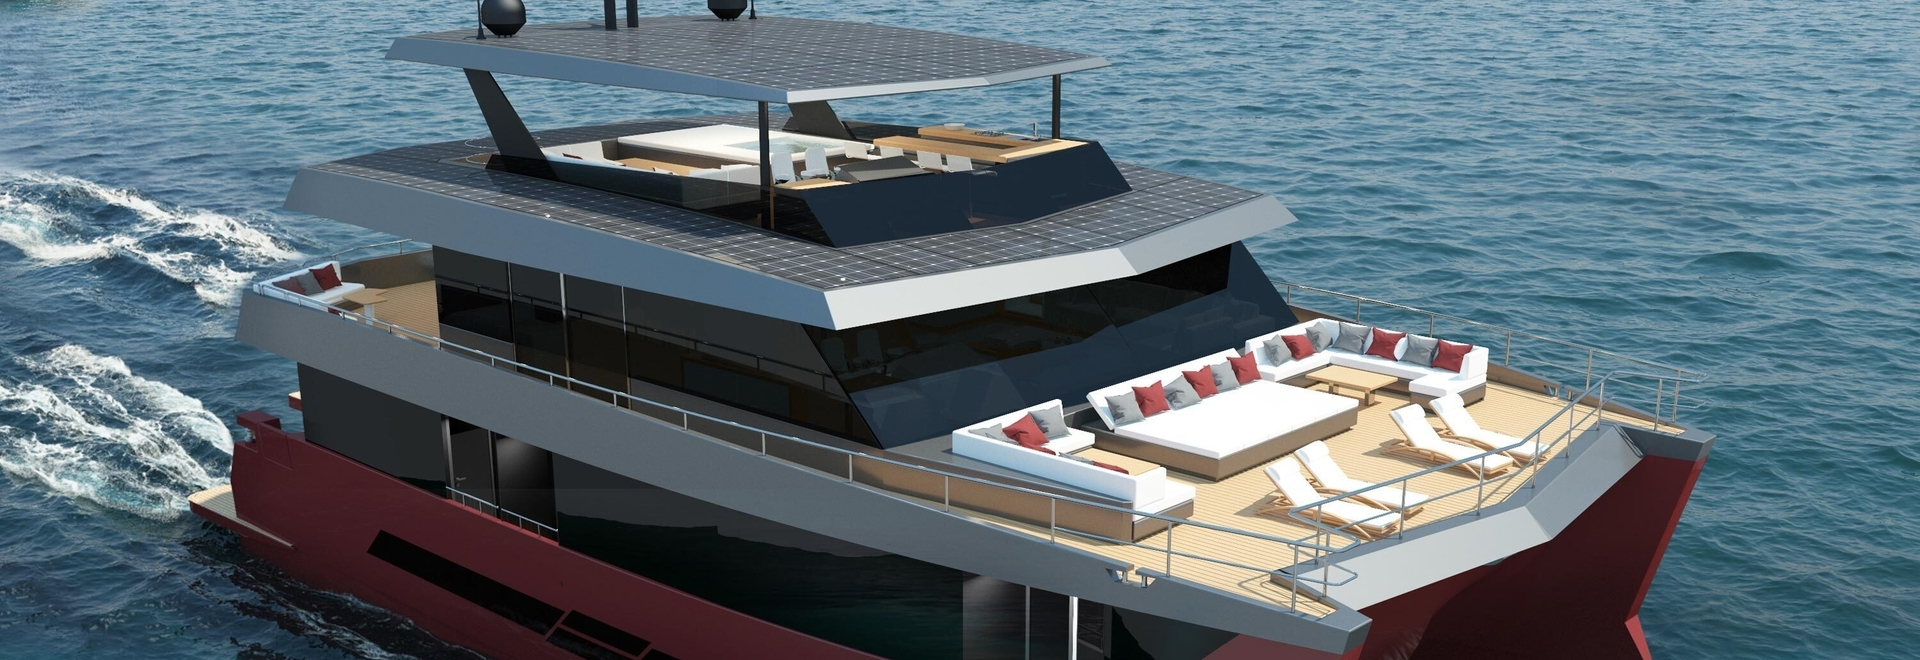 Spaceline 100 Hybrid, a new concept in luxury motor catamarans